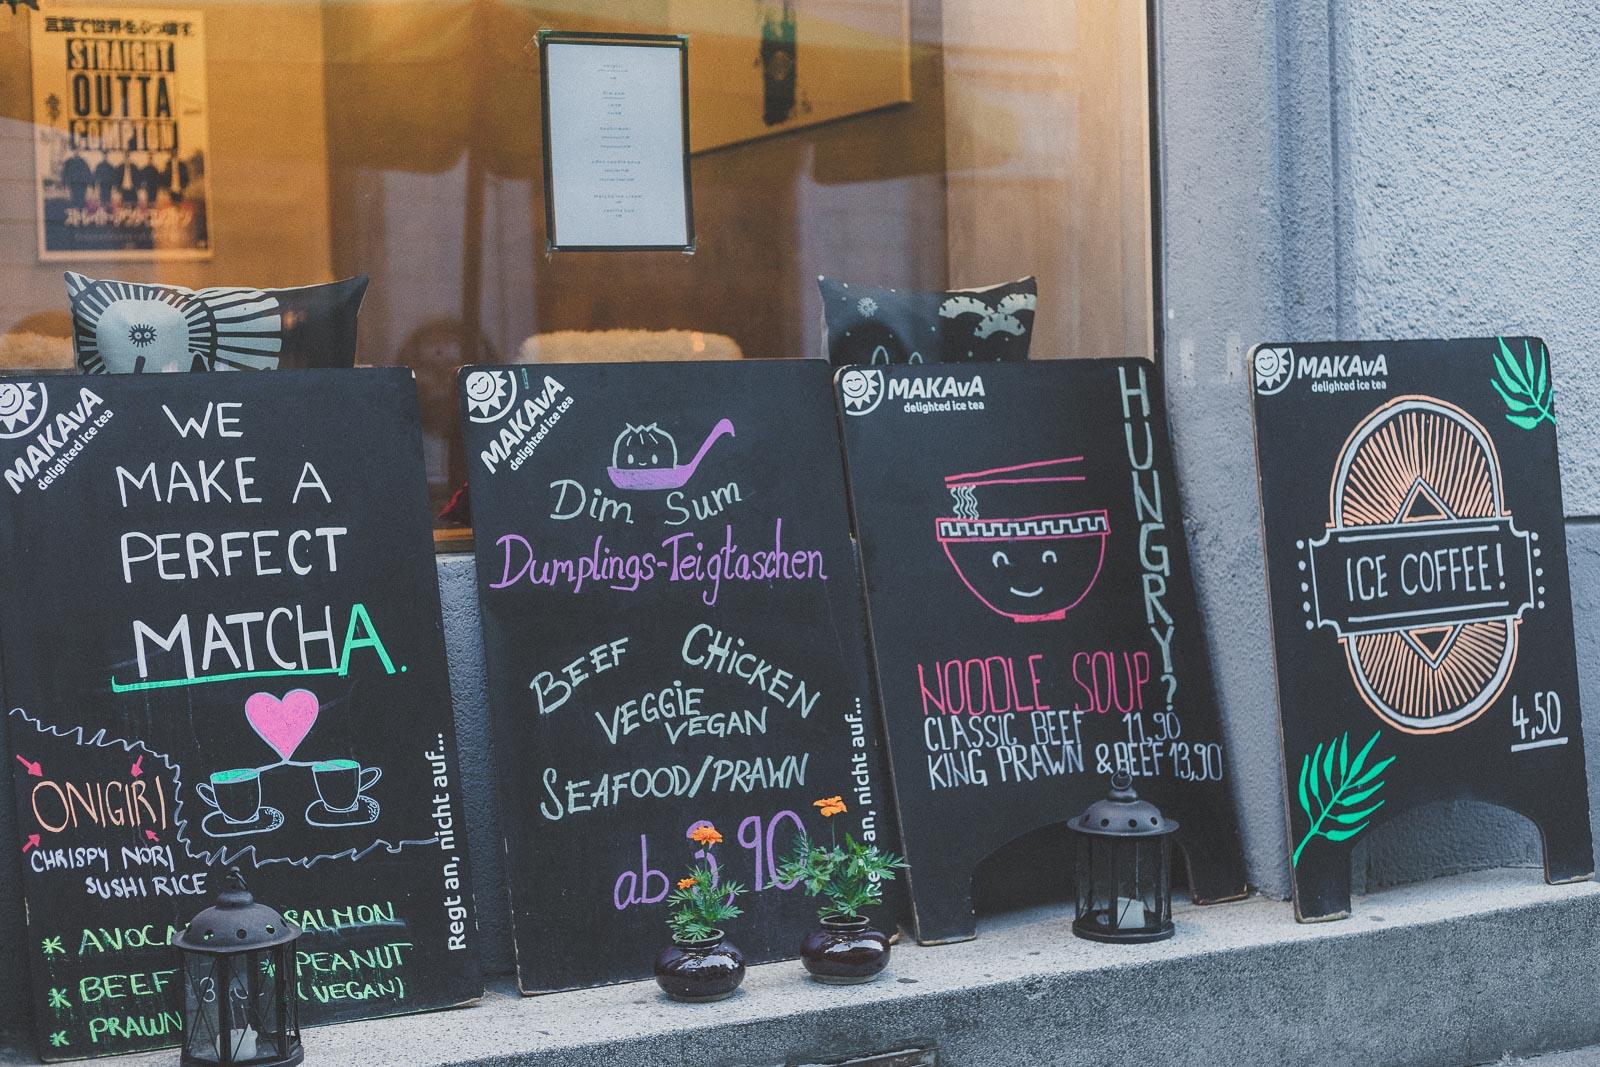 Oh Matcha Graz, Kaffee trinken in Graz - Das sind die besten Cafés & Coffee Shops // Cafés in Graz, Kaffee trinken, Graz Blog, www.miss-classy.com #cafe #kaffee #graz